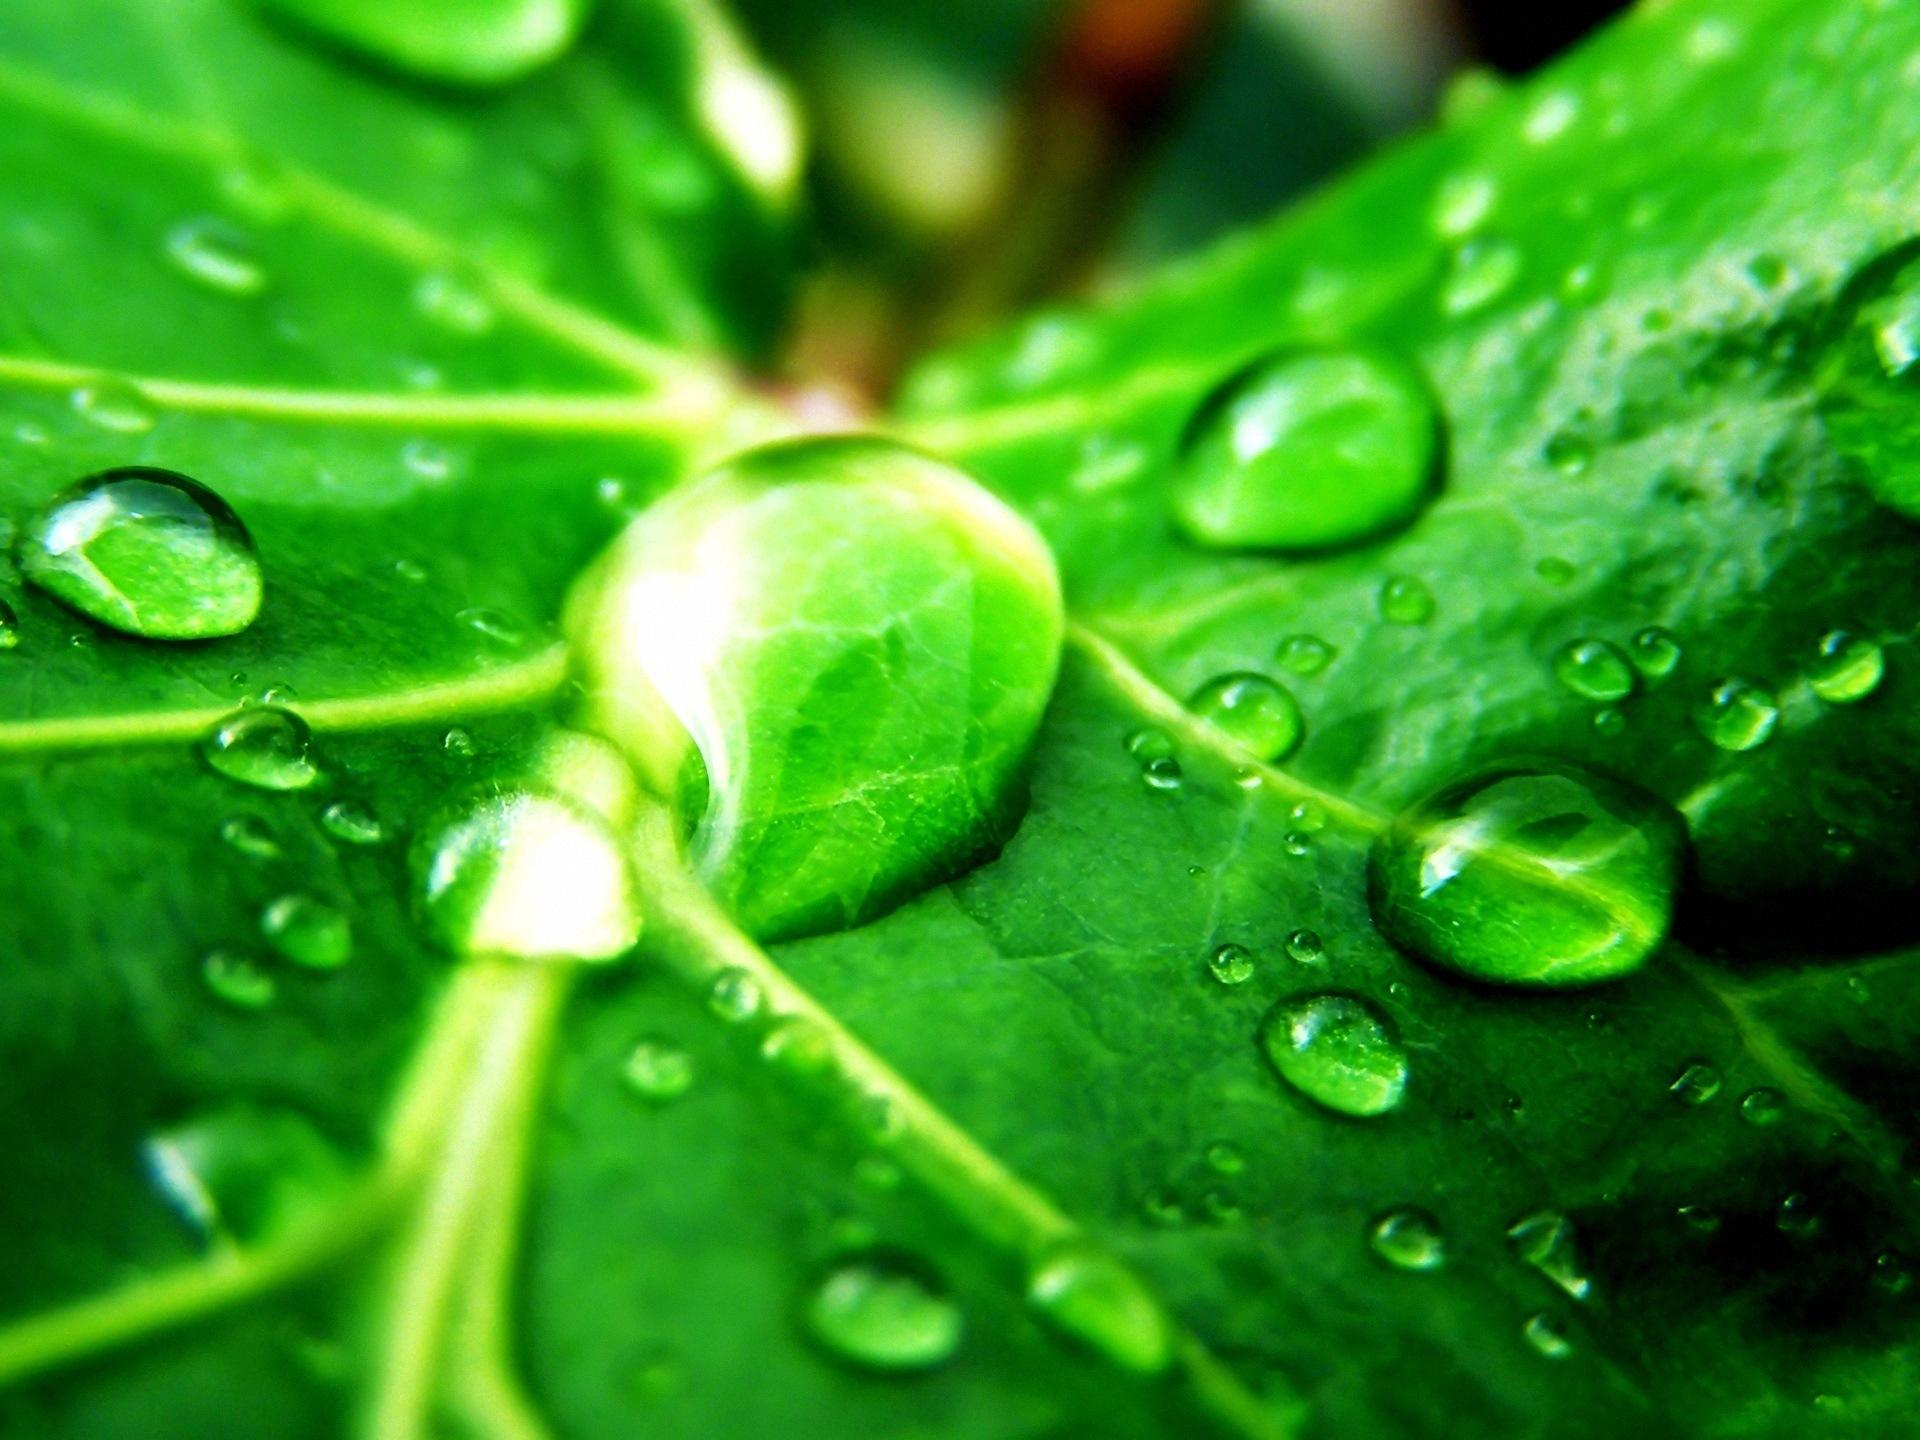 Download Green Nature Wallpaper Green Hd Wallpapers Green Nature